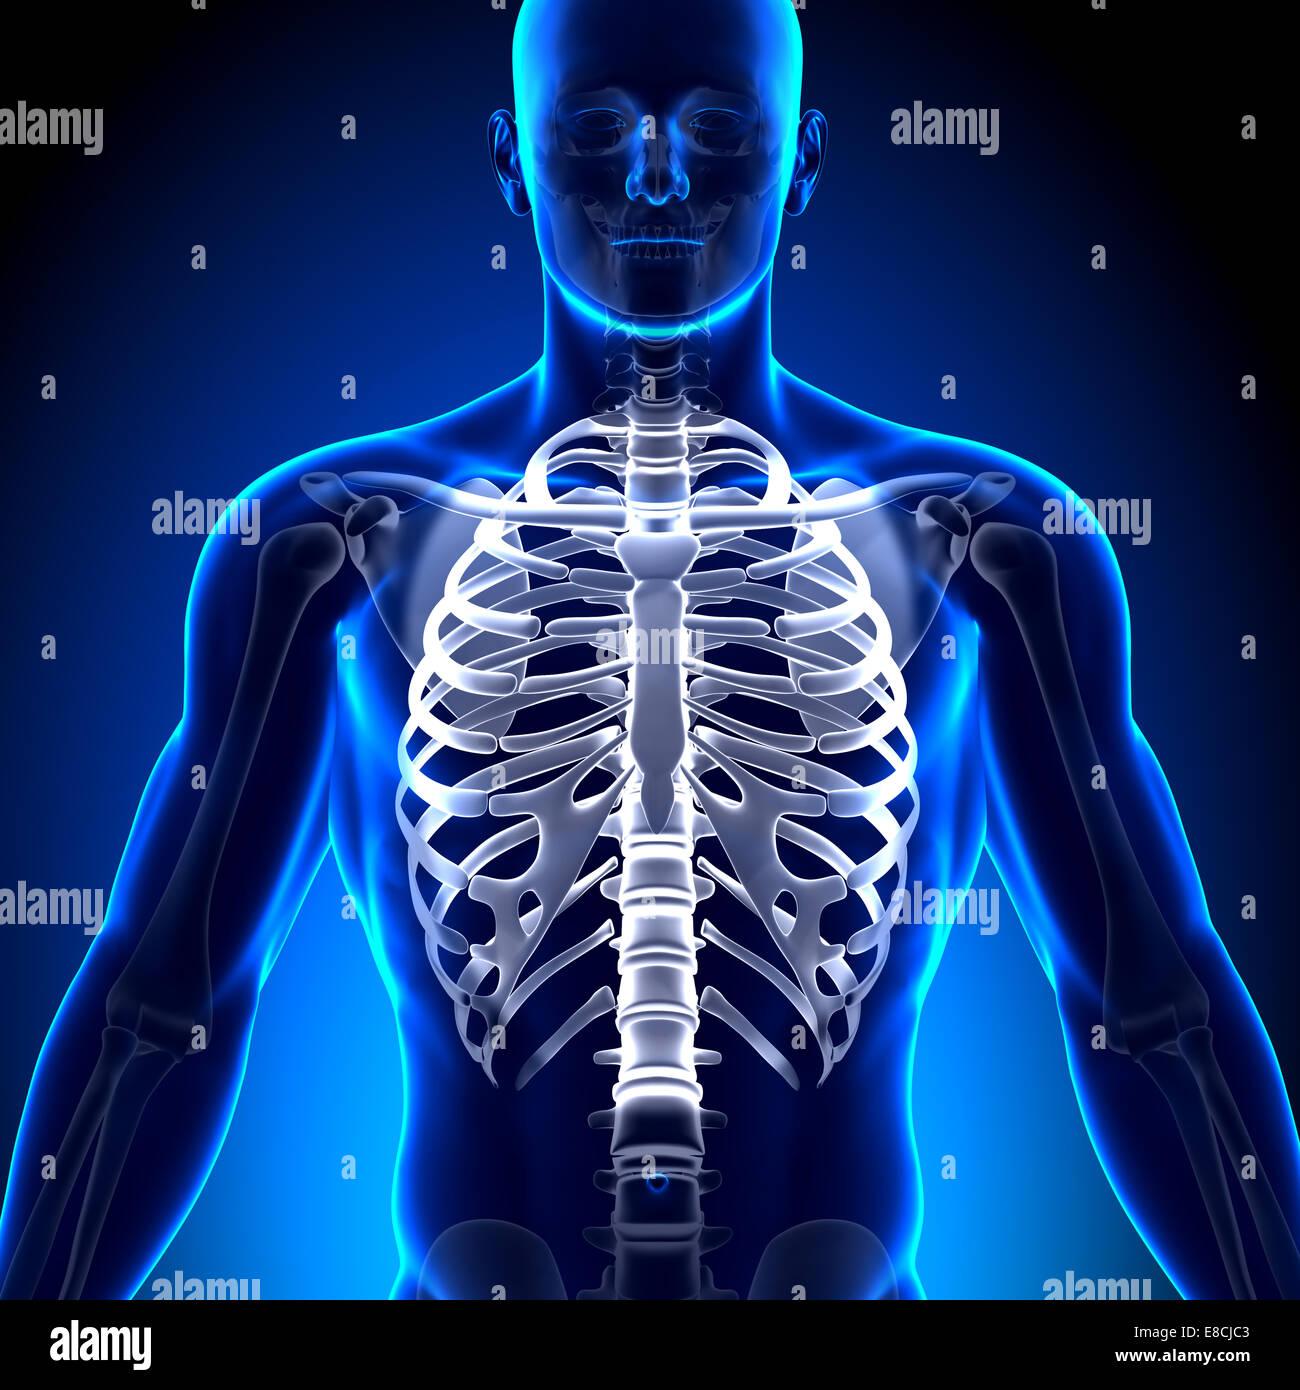 Brustkorb / Brustbein - Anatomie-Knochen Stockfoto, Bild: 74036595 ...